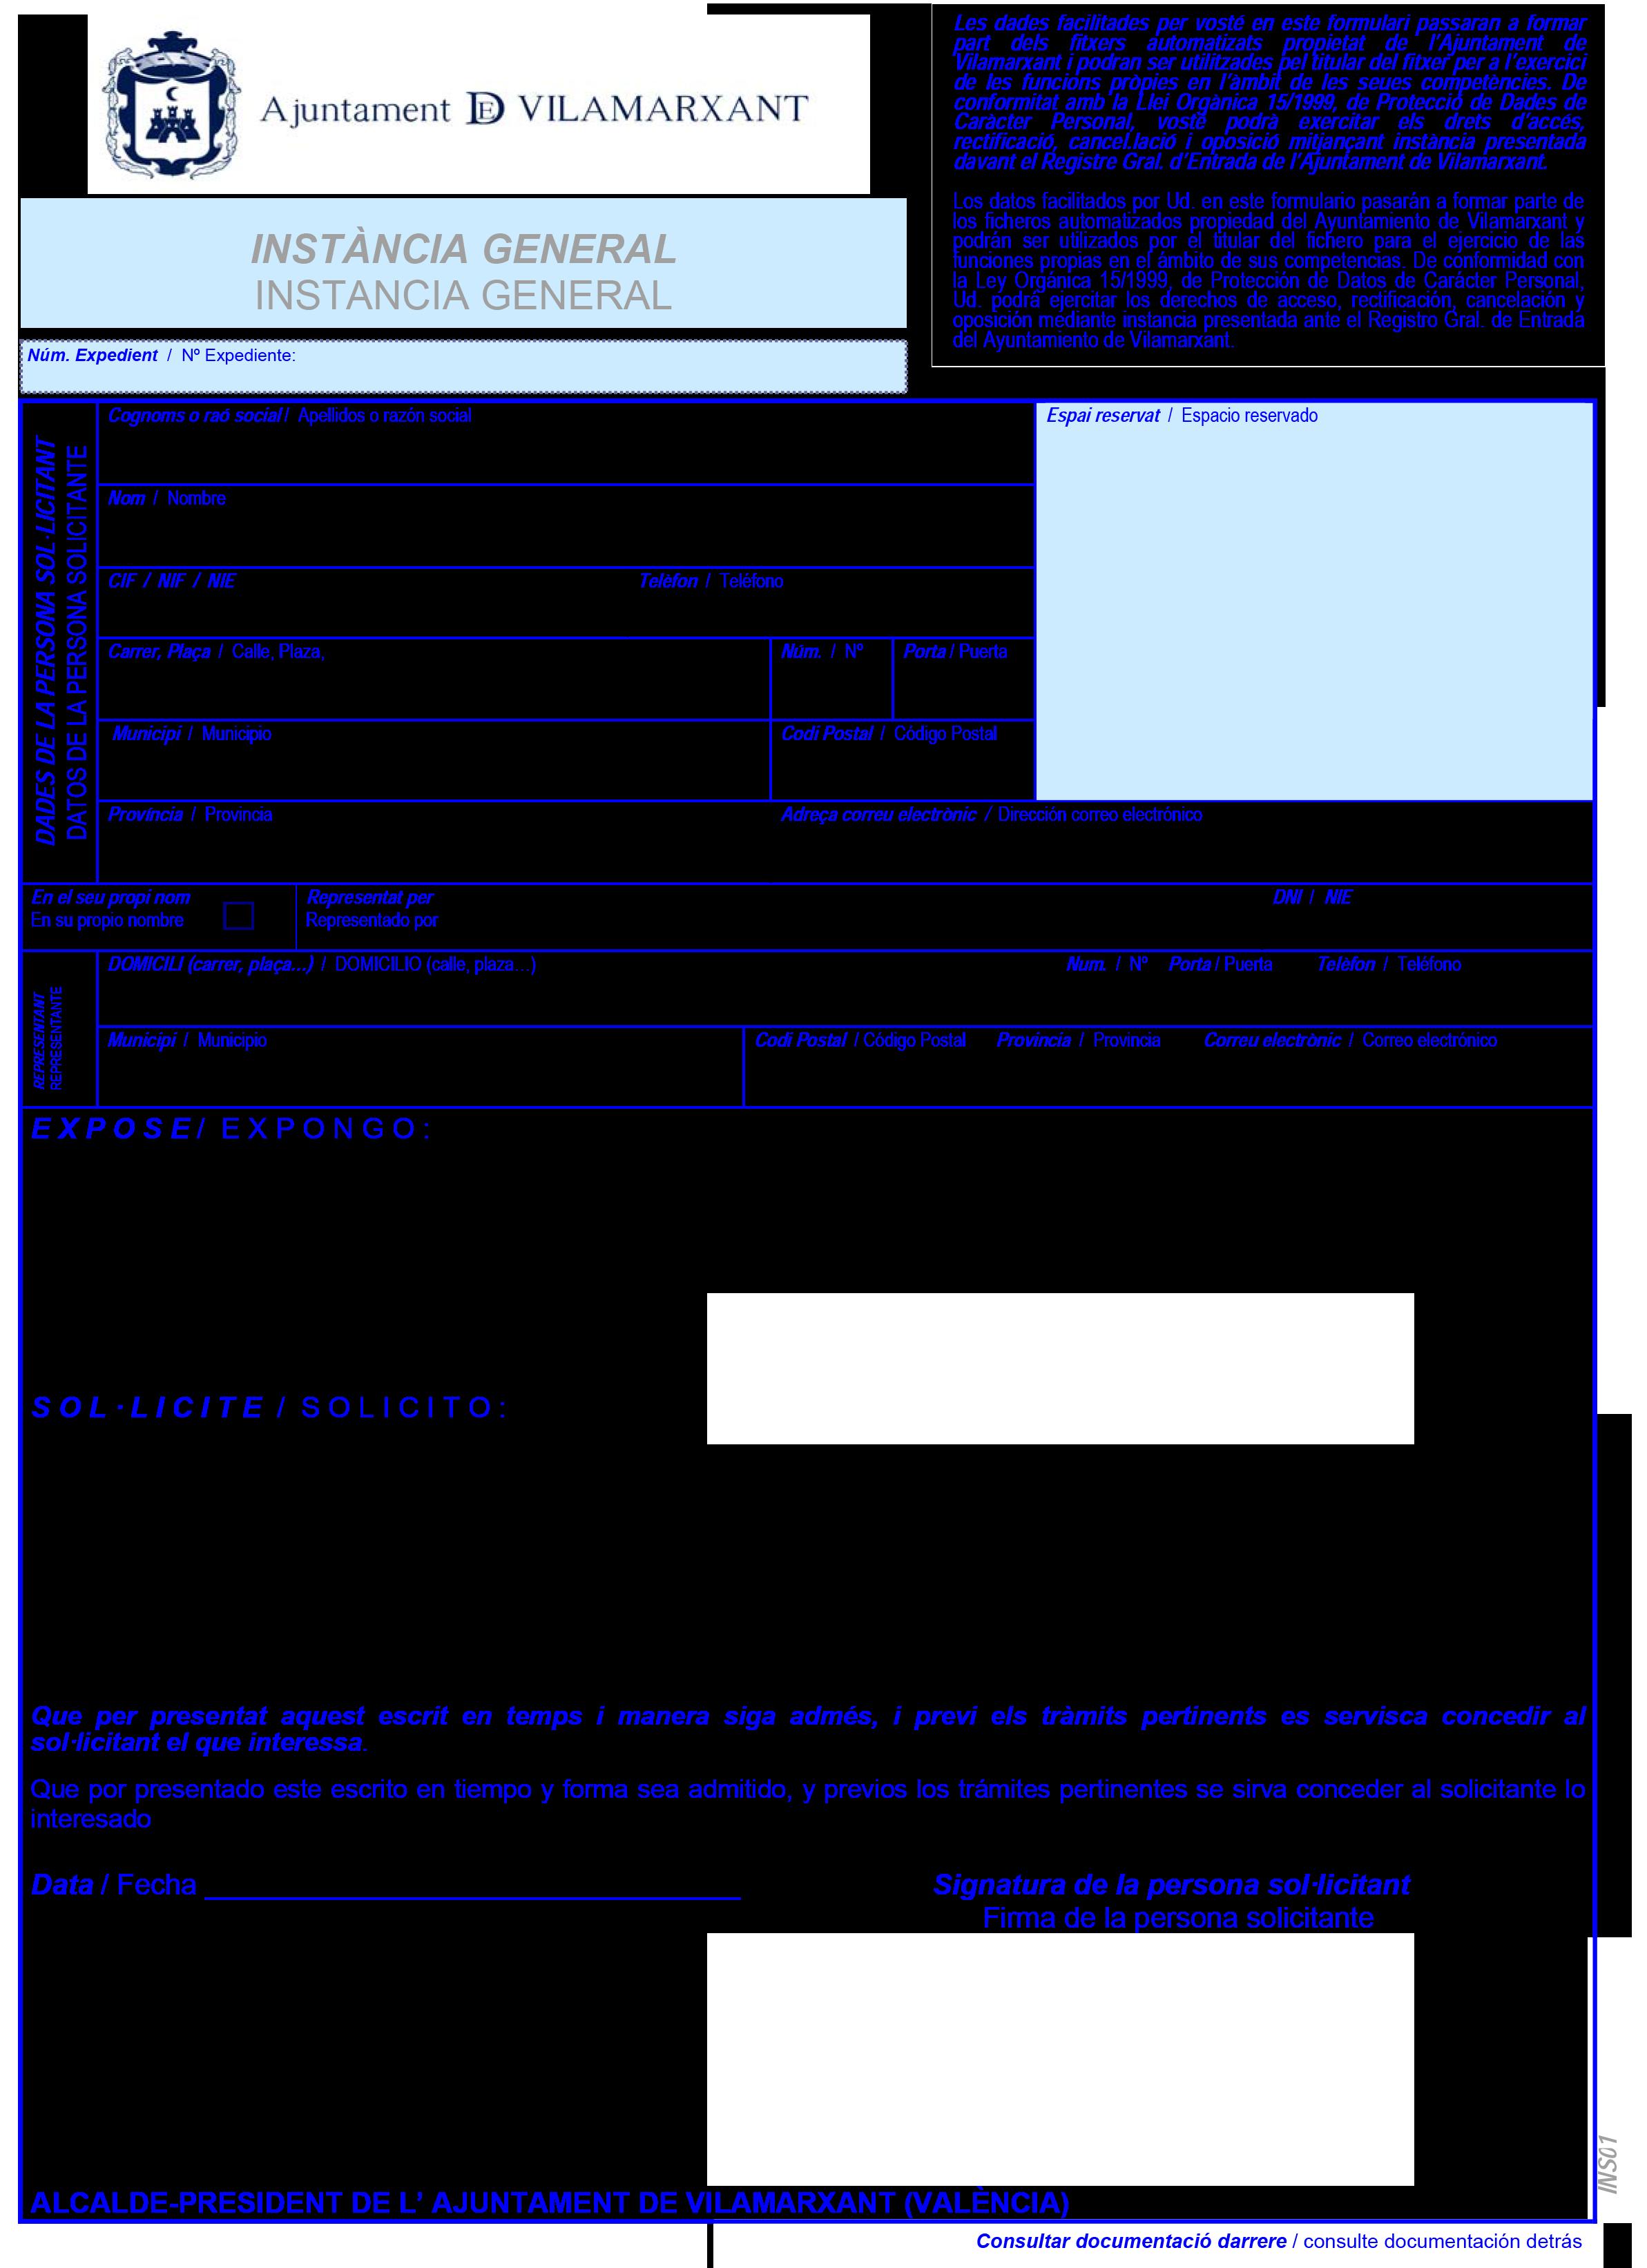 Impreso Declaración Responsable Segunda Ocupación - Vilamarxant-1